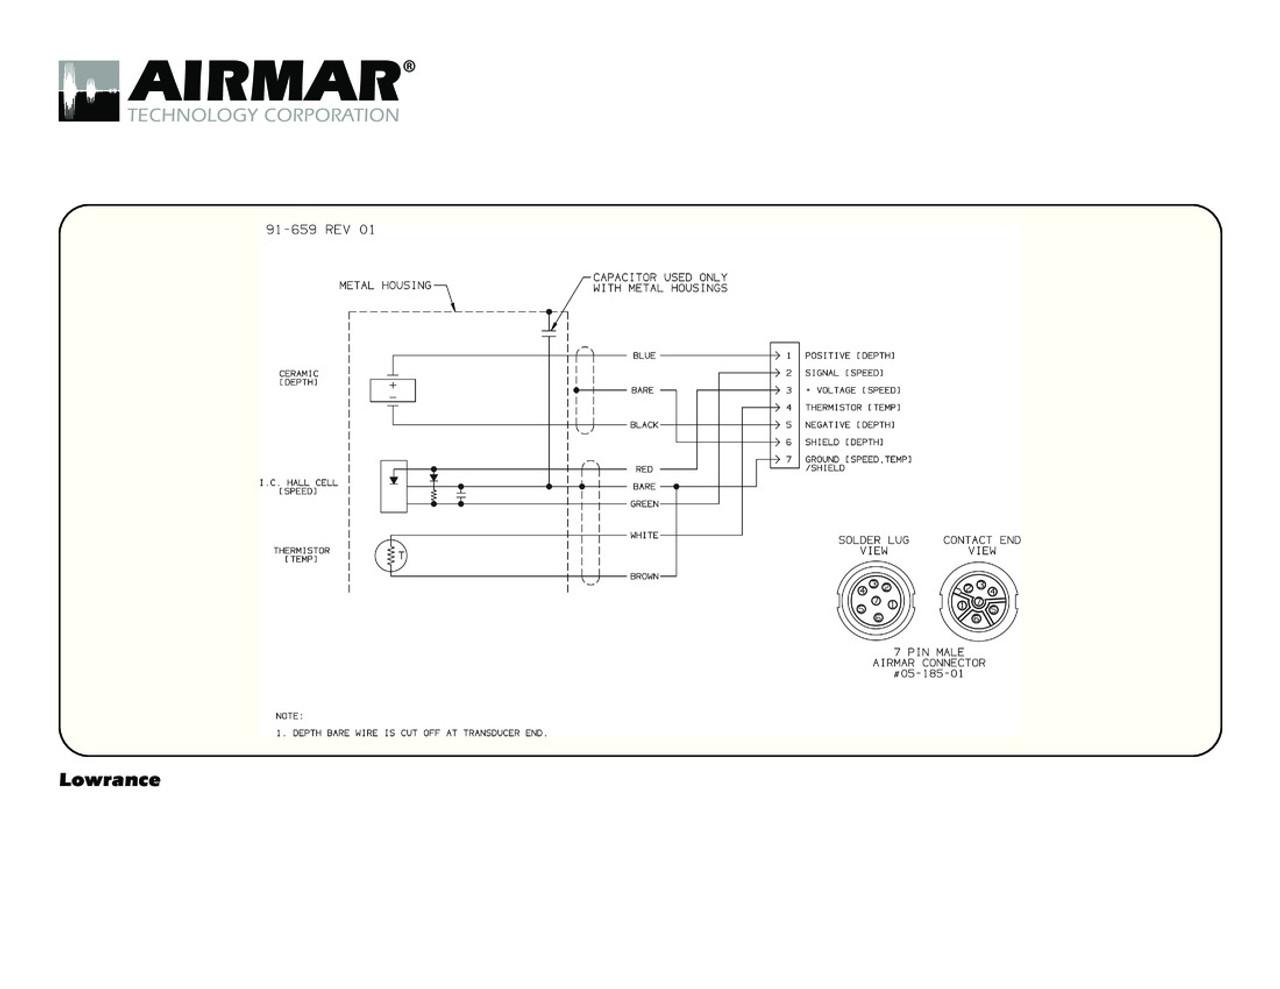 airmar wiring diagram lowrance 7 pin d s t blue bottle marinedepth [ 1100 x 850 Pixel ]